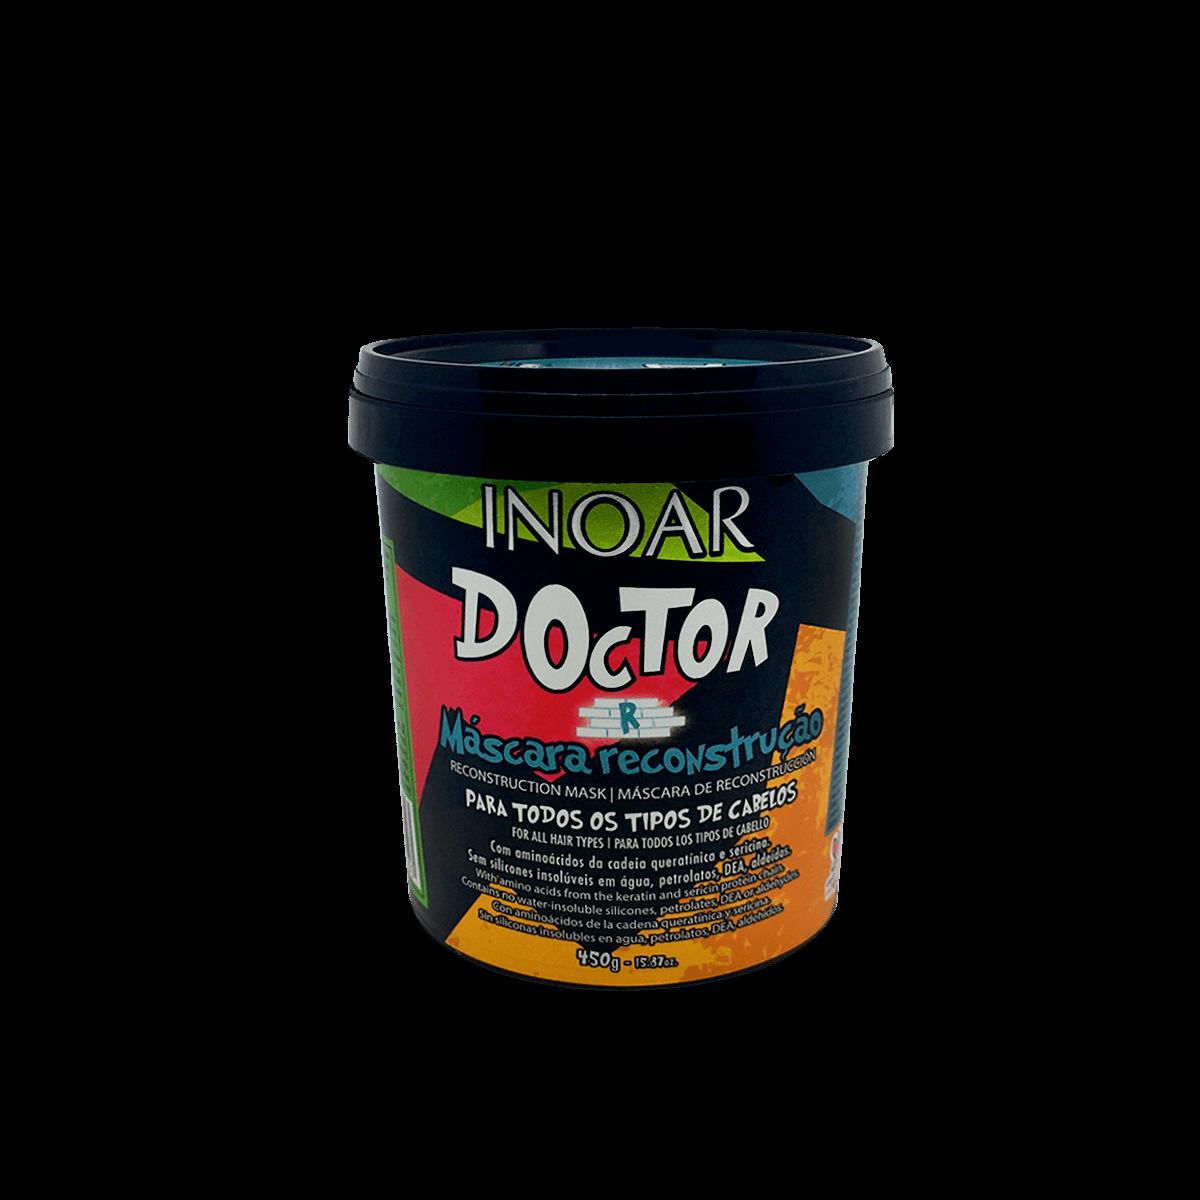 Inoar Mascara Doctor Reconstrucao - 450g